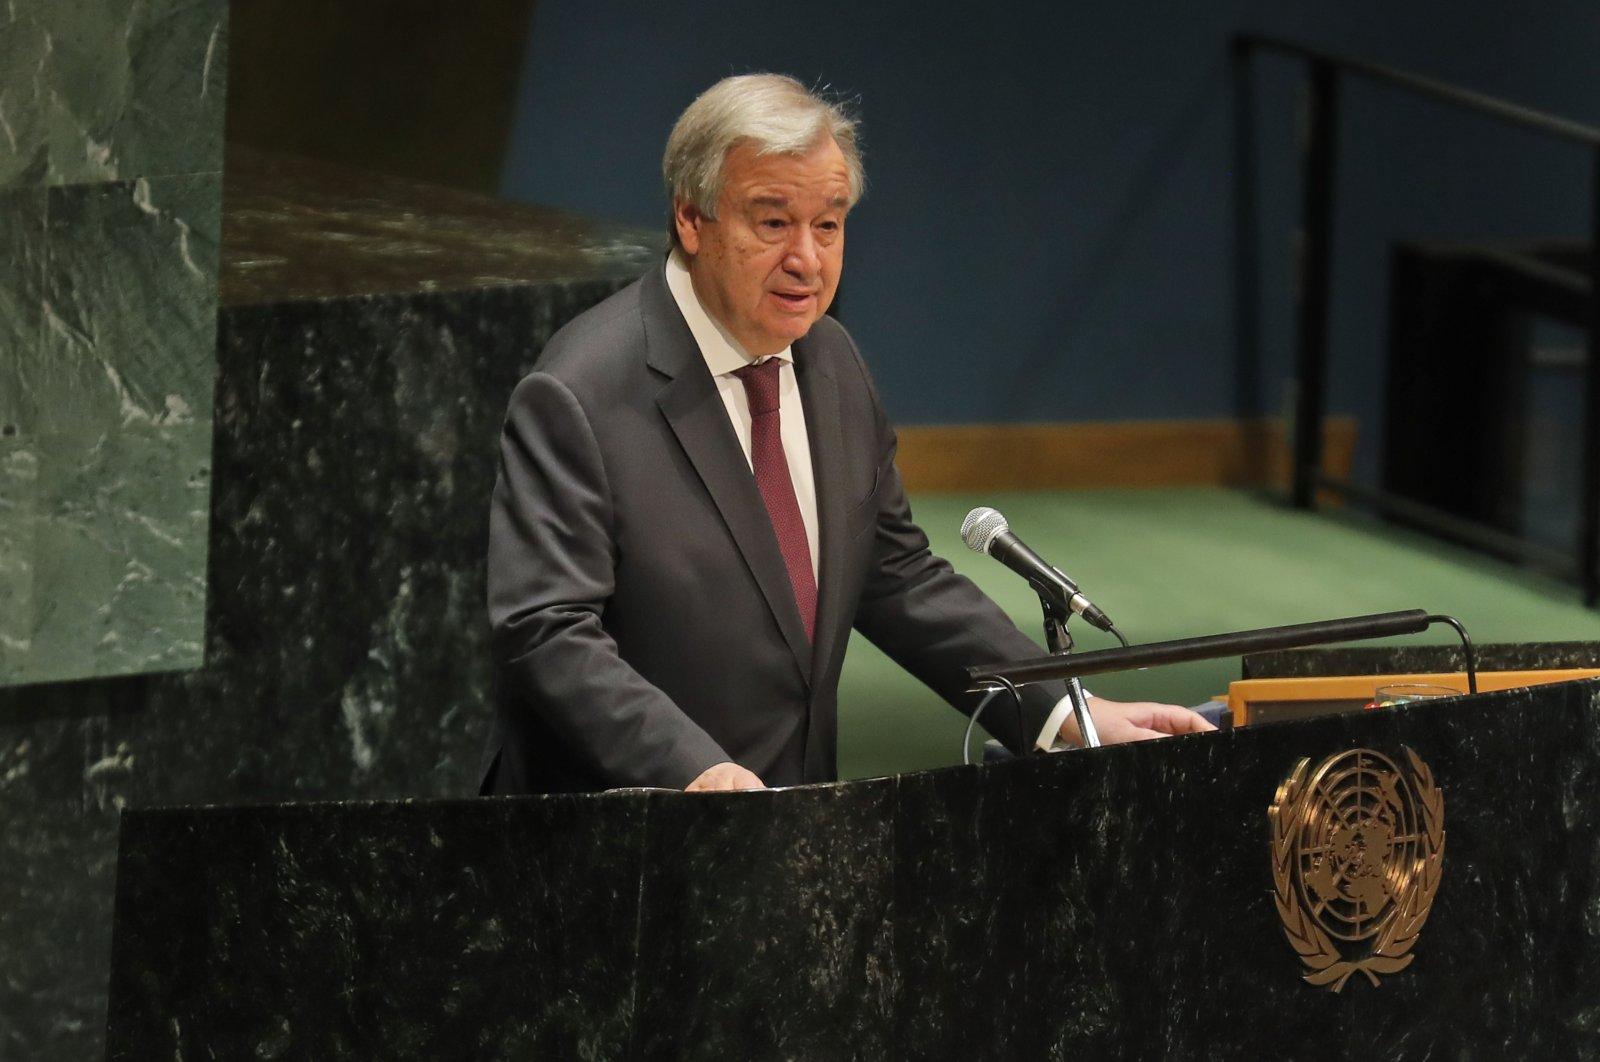 United Nations Secretary-General Antonio Guterres speaks during a Holocaust memorial event at U.N. headquarters, Monday, Jan. 27, 2020. (AP Photo)